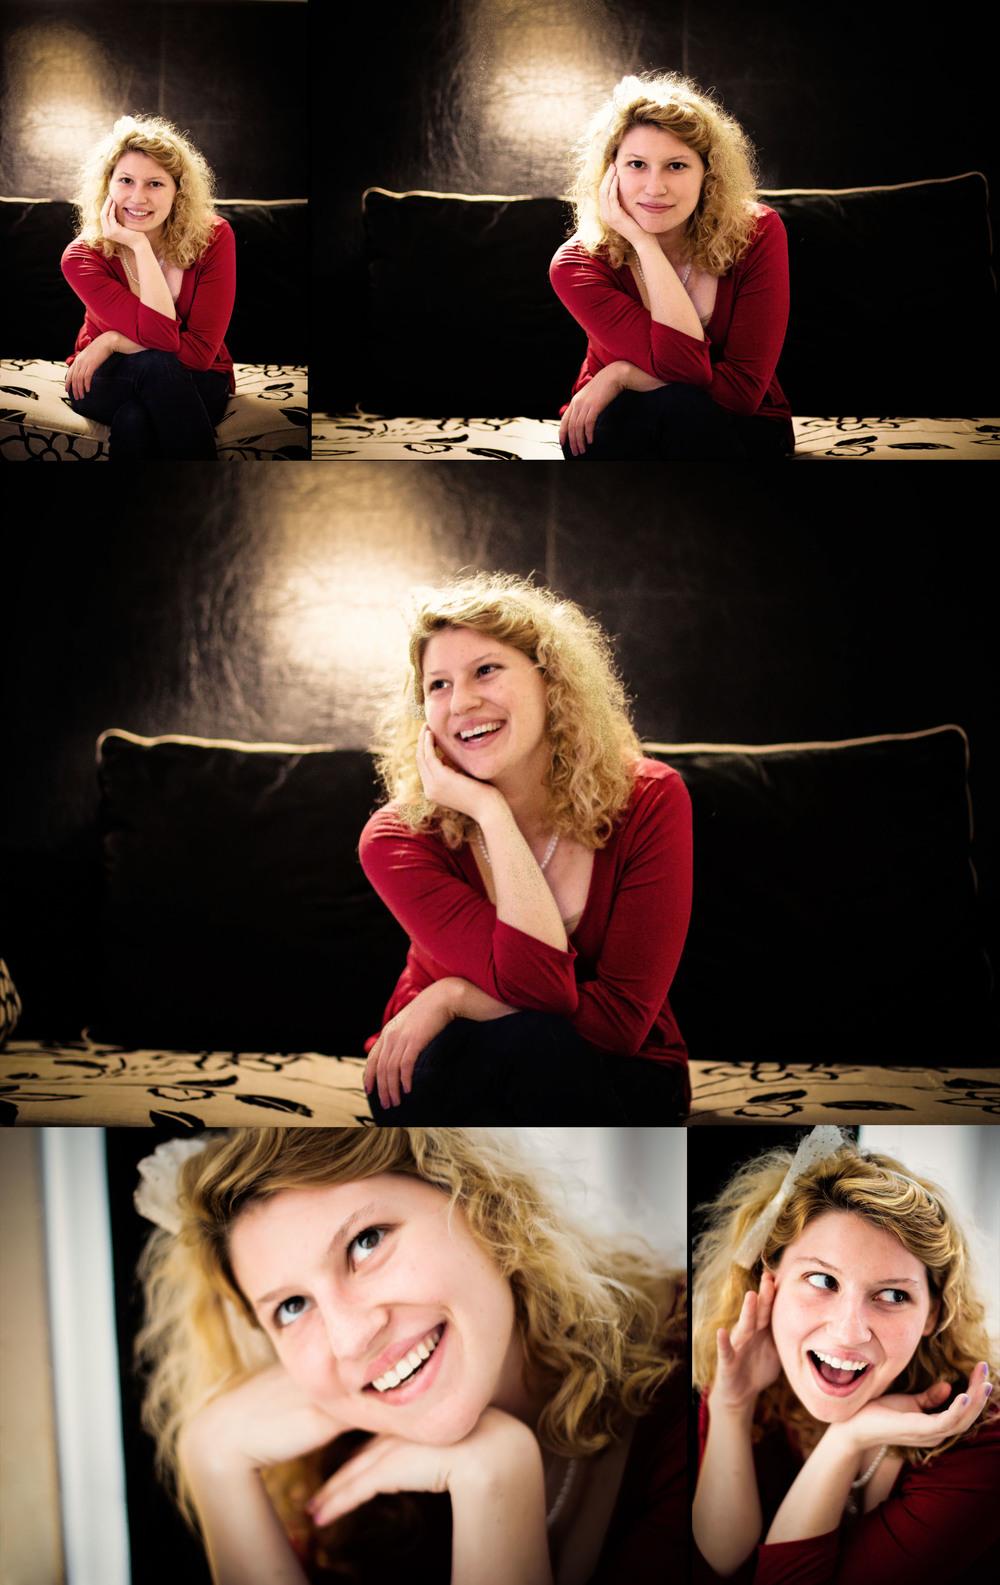 emily wilson photography Katie Barcelona.jpg